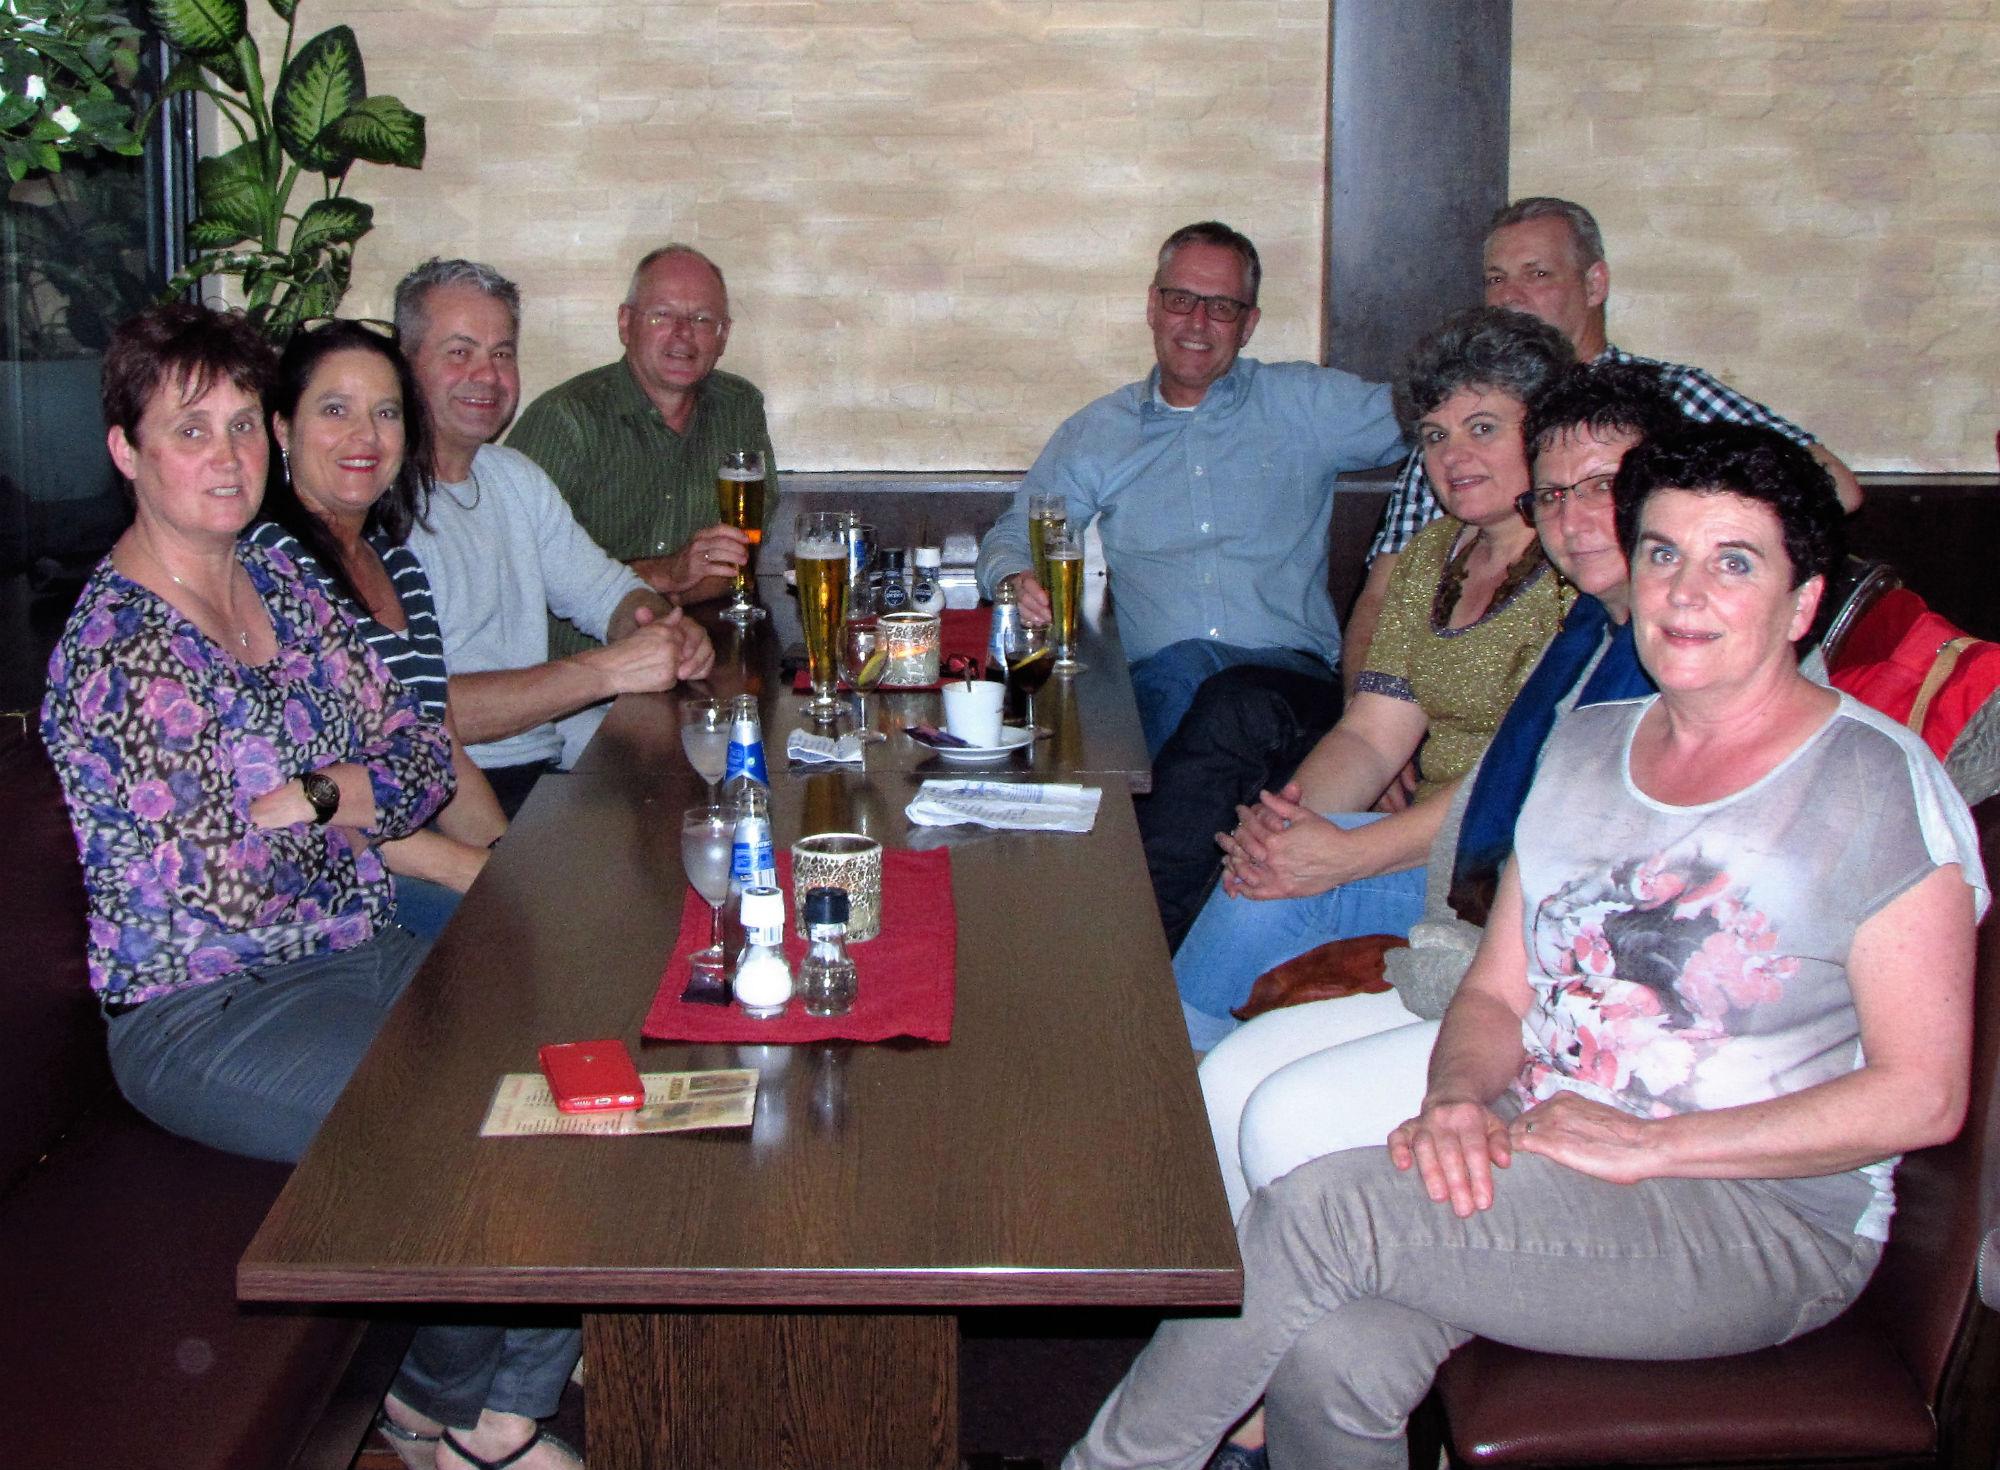 Childhood friends: Diny, Roberta,, Peter, Frank, Jo, Harry, Anjes, Francien, Karin